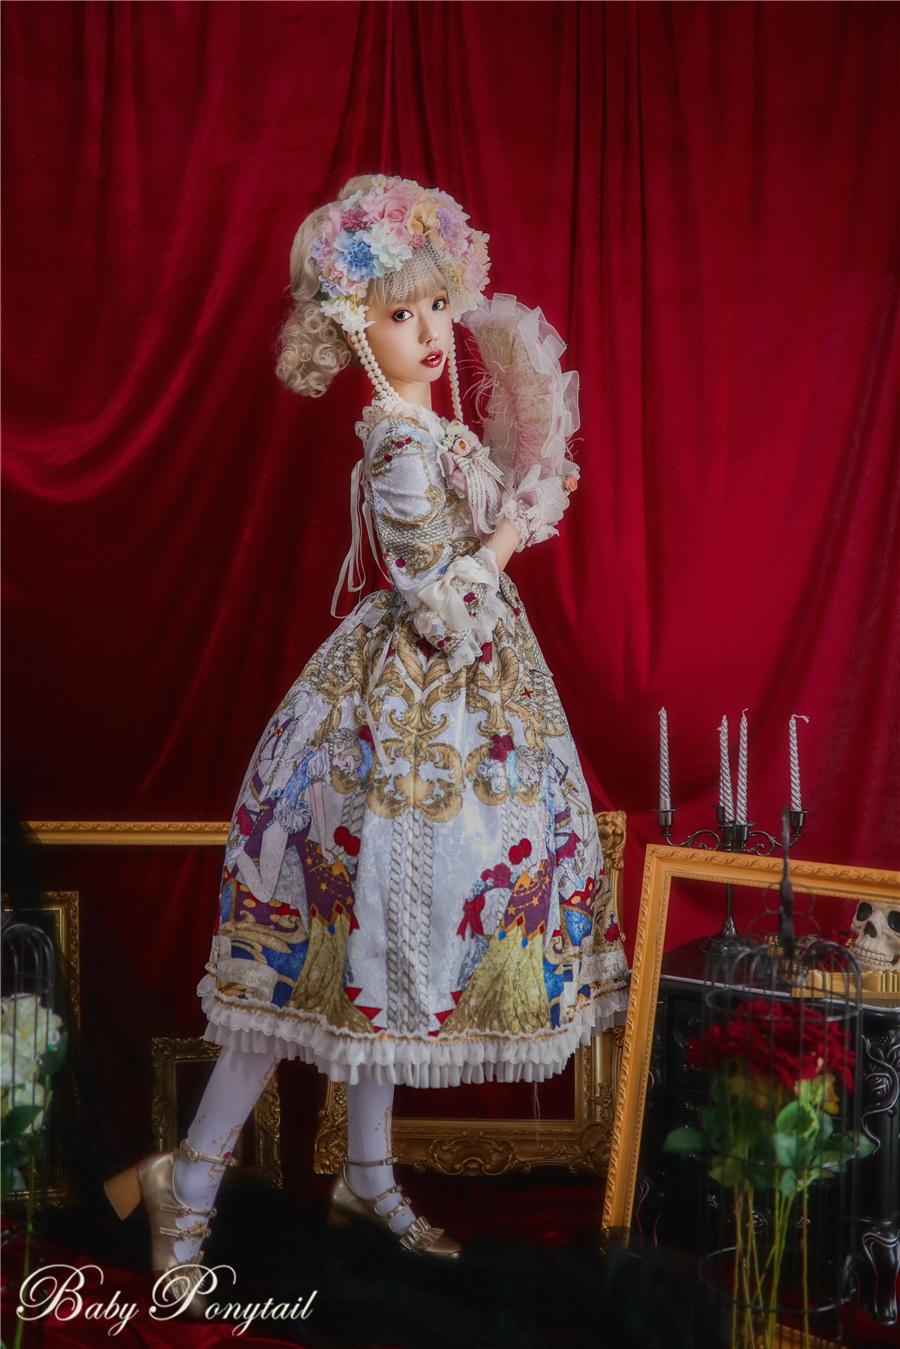 Baby Ponytail_Circus Princess_Silver OP_Kaka_09.jpg